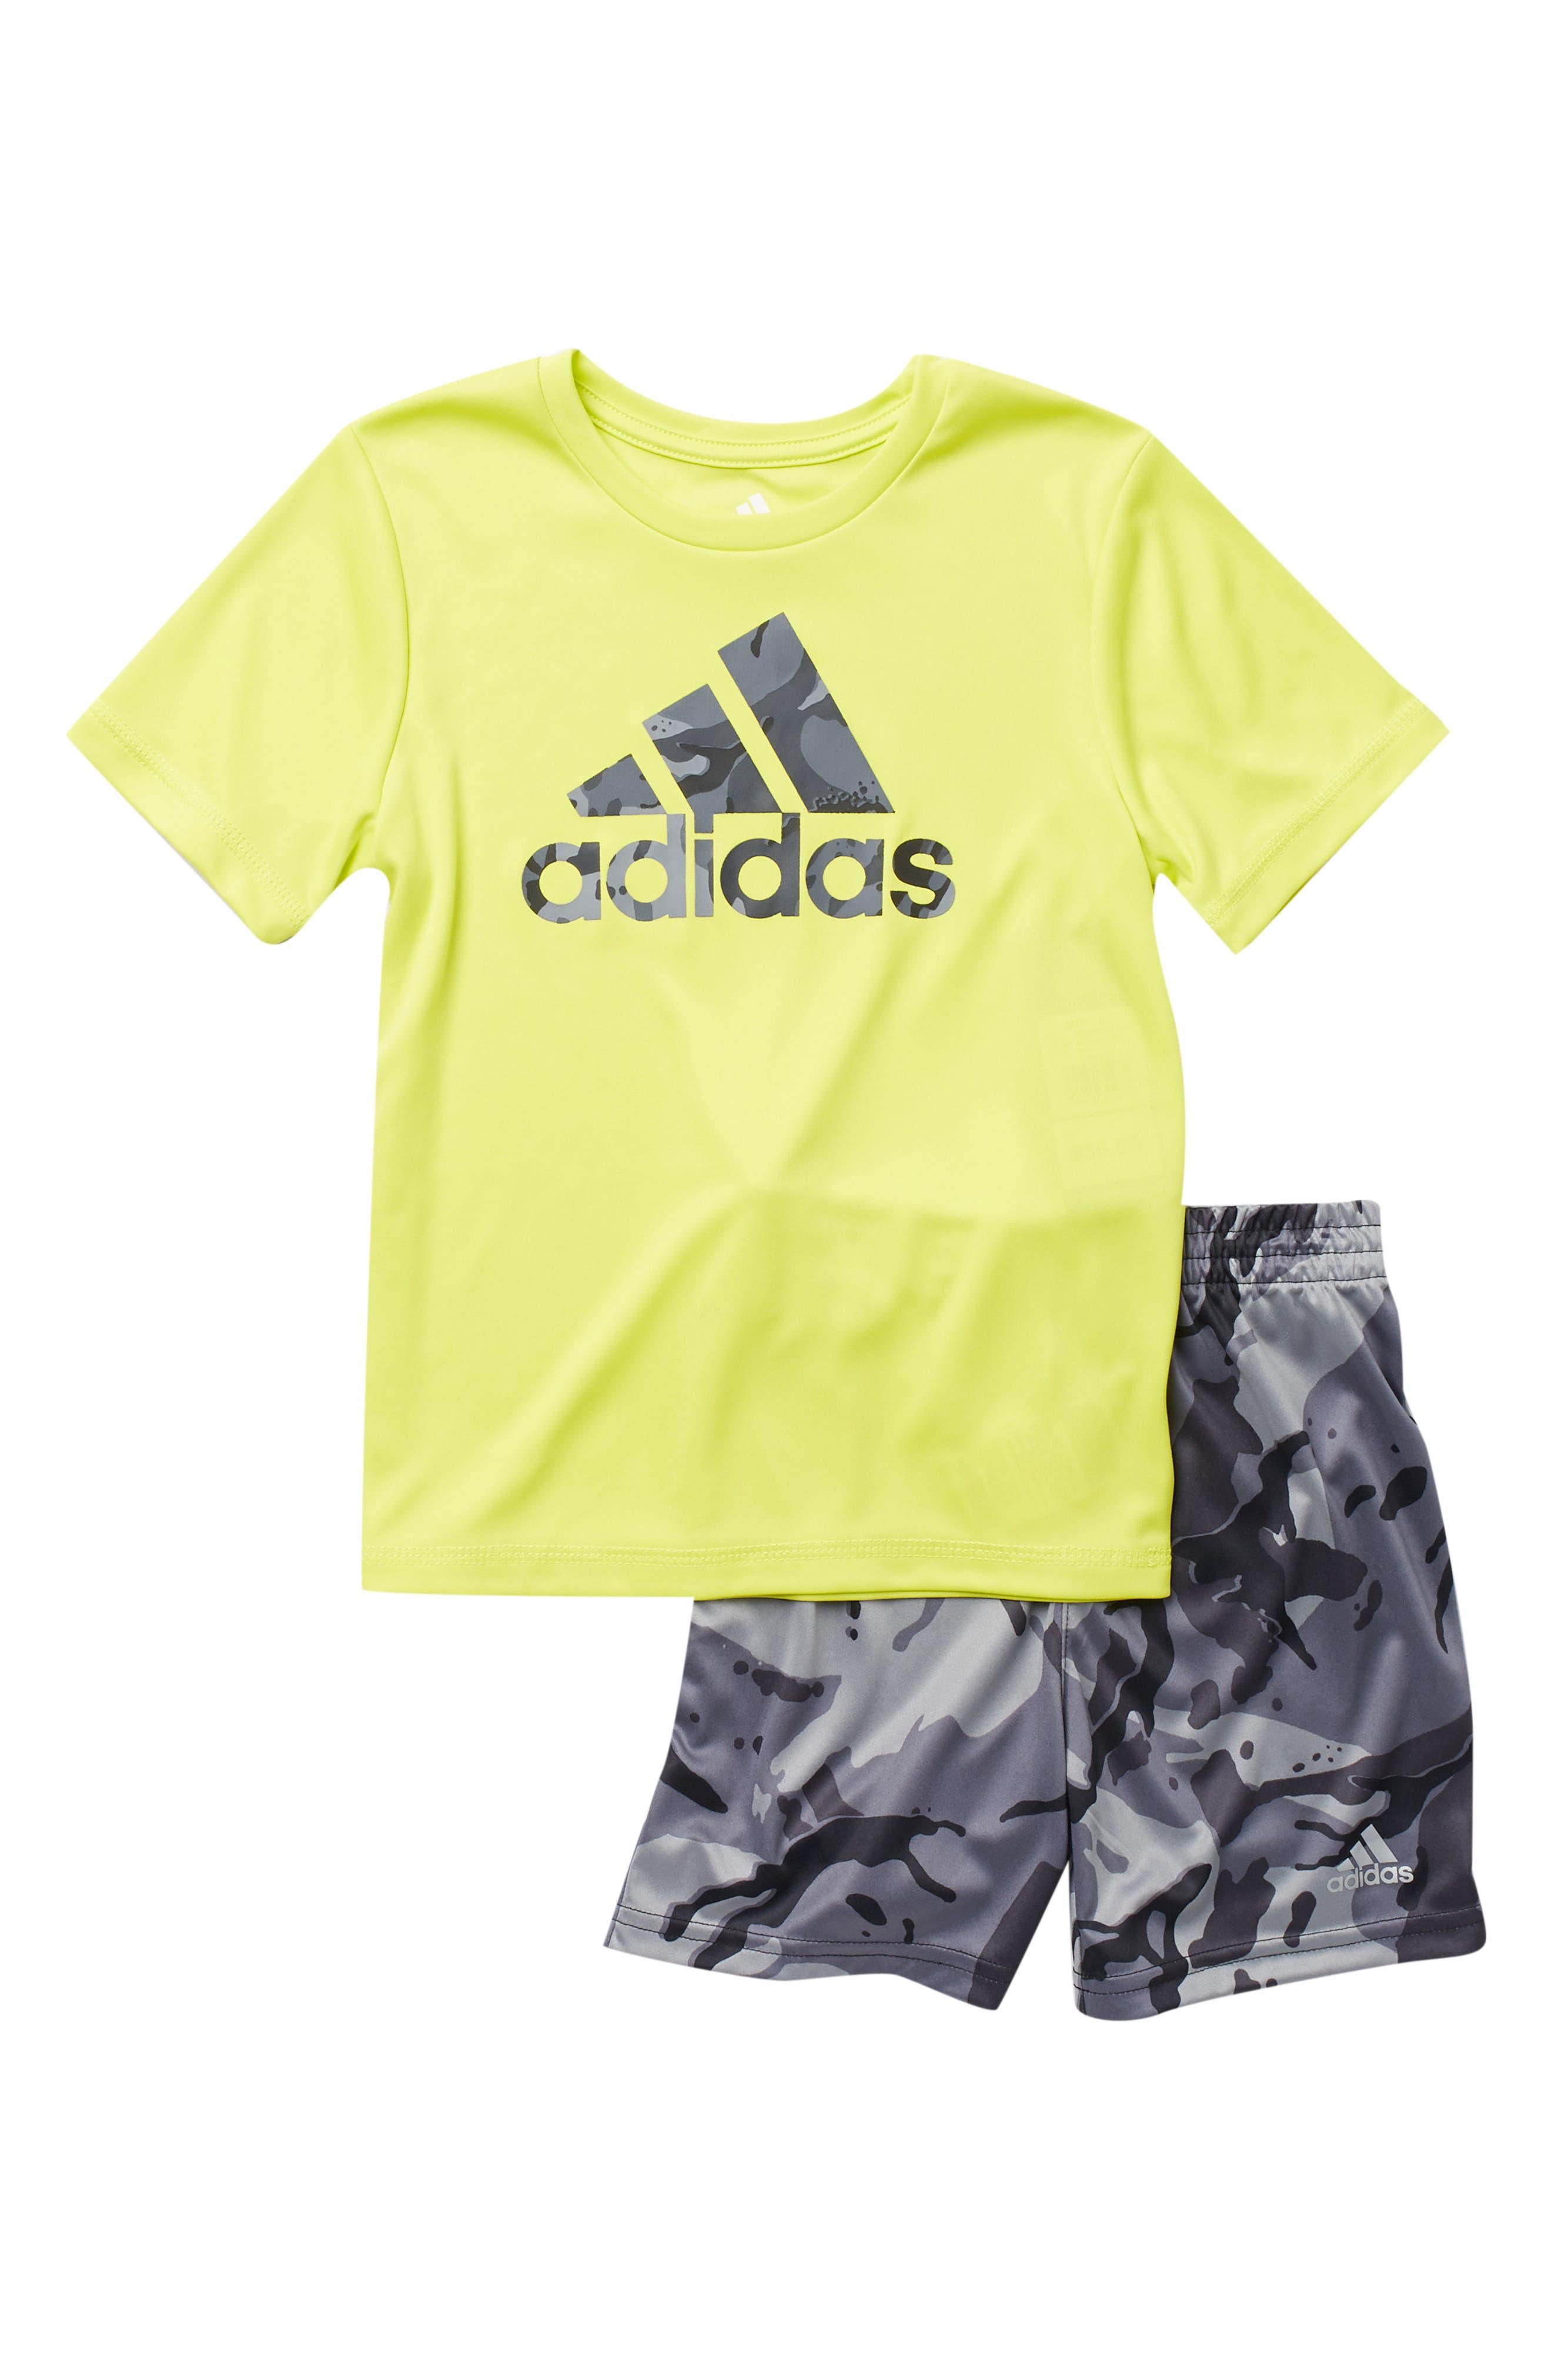 Image of adidas Classic Tee & Camo Shorts 2-Piece Set